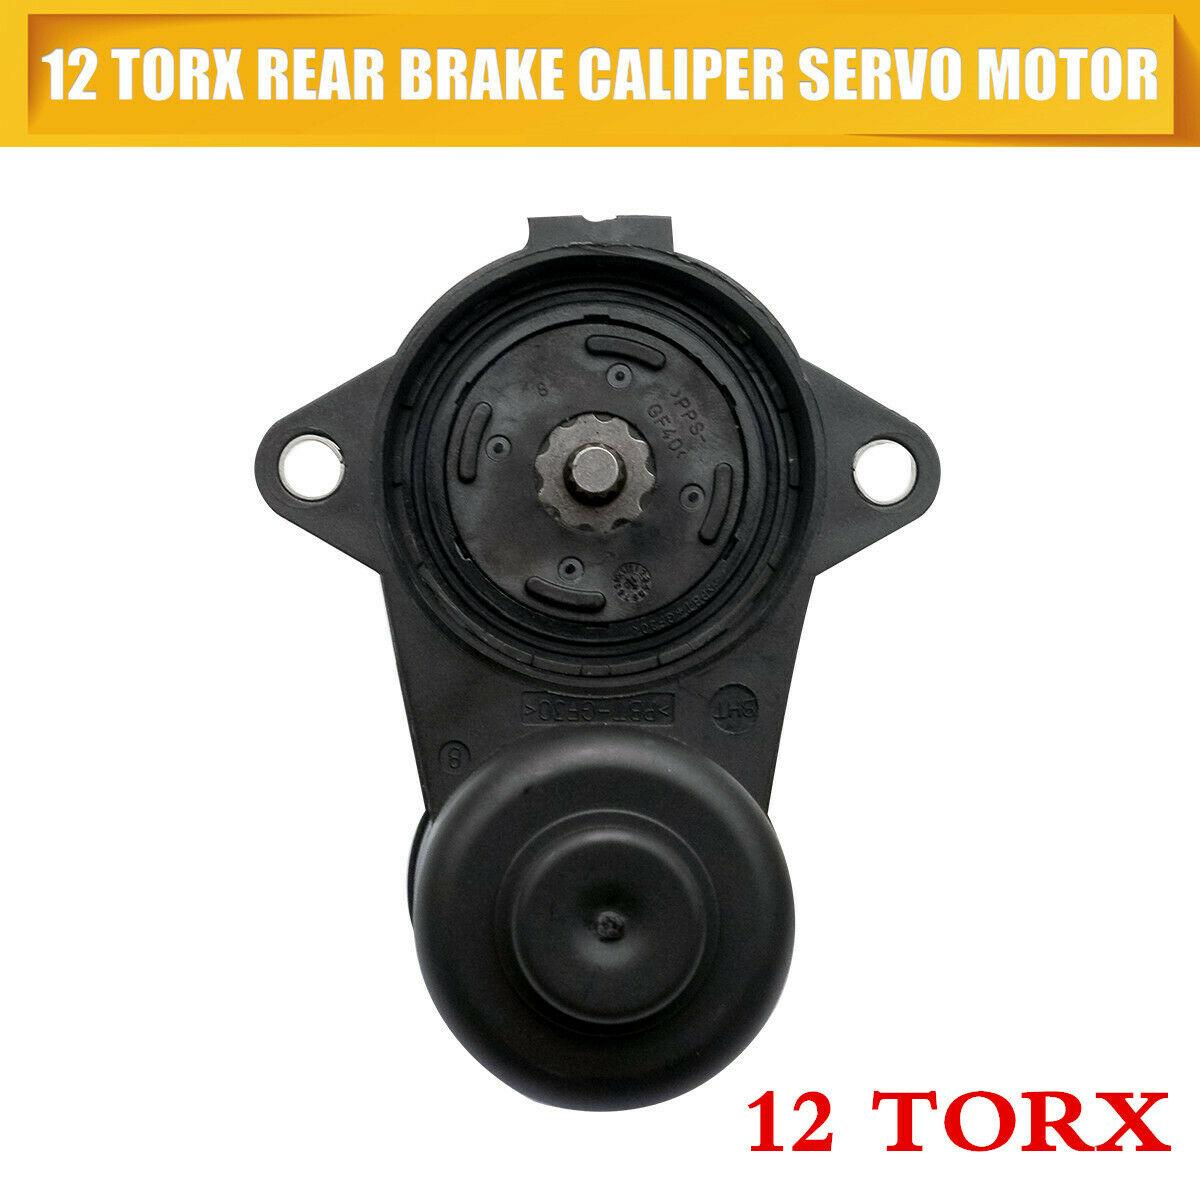 Caliper 12-Torx Motor-Actuator Servo Parking-Brake-Parking-Caliper Rear-Brake Plastic